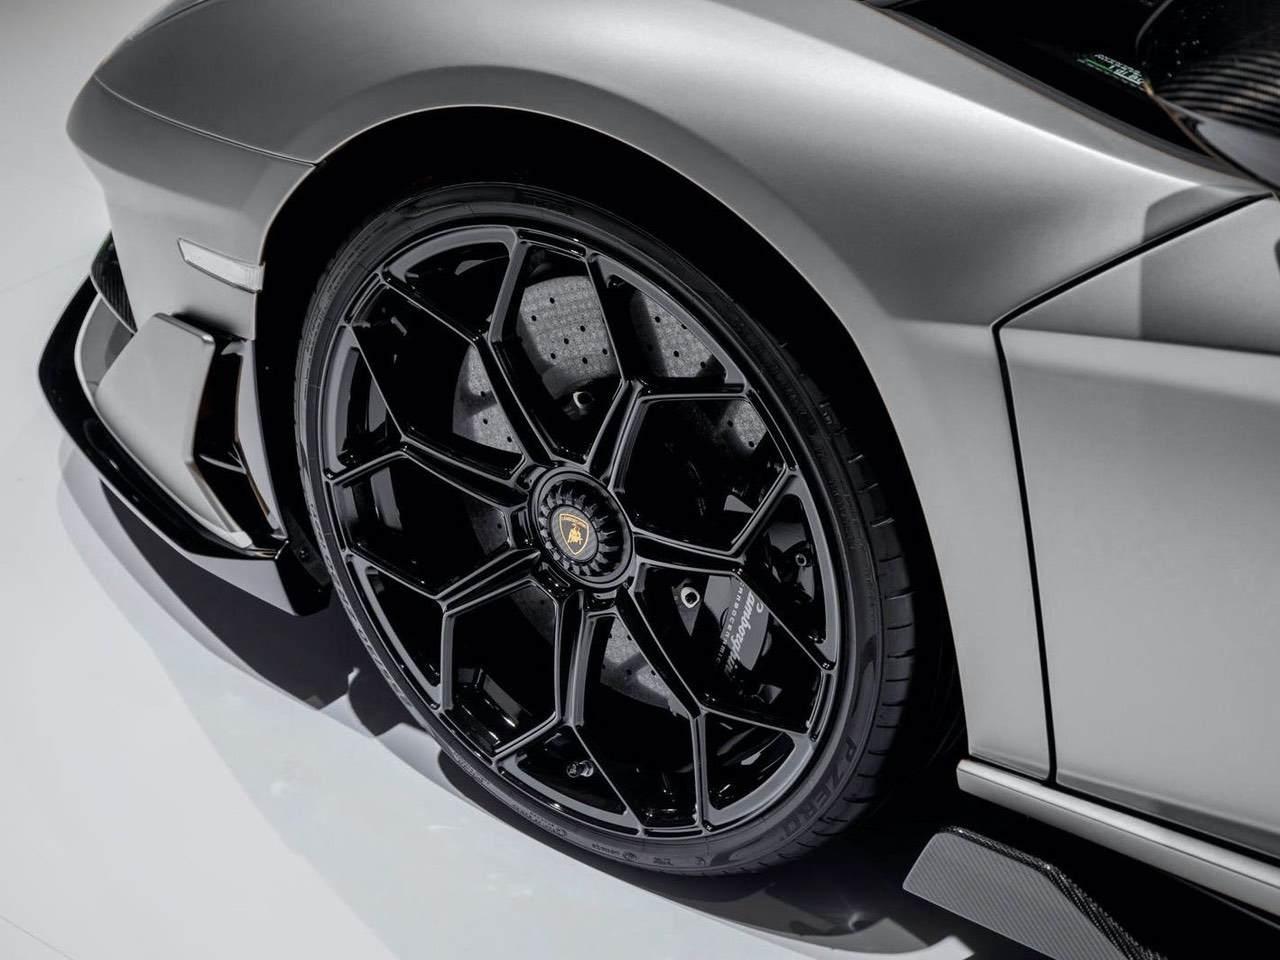 Lamborghini-Aventador-SVJ-Roadster-Grey-7